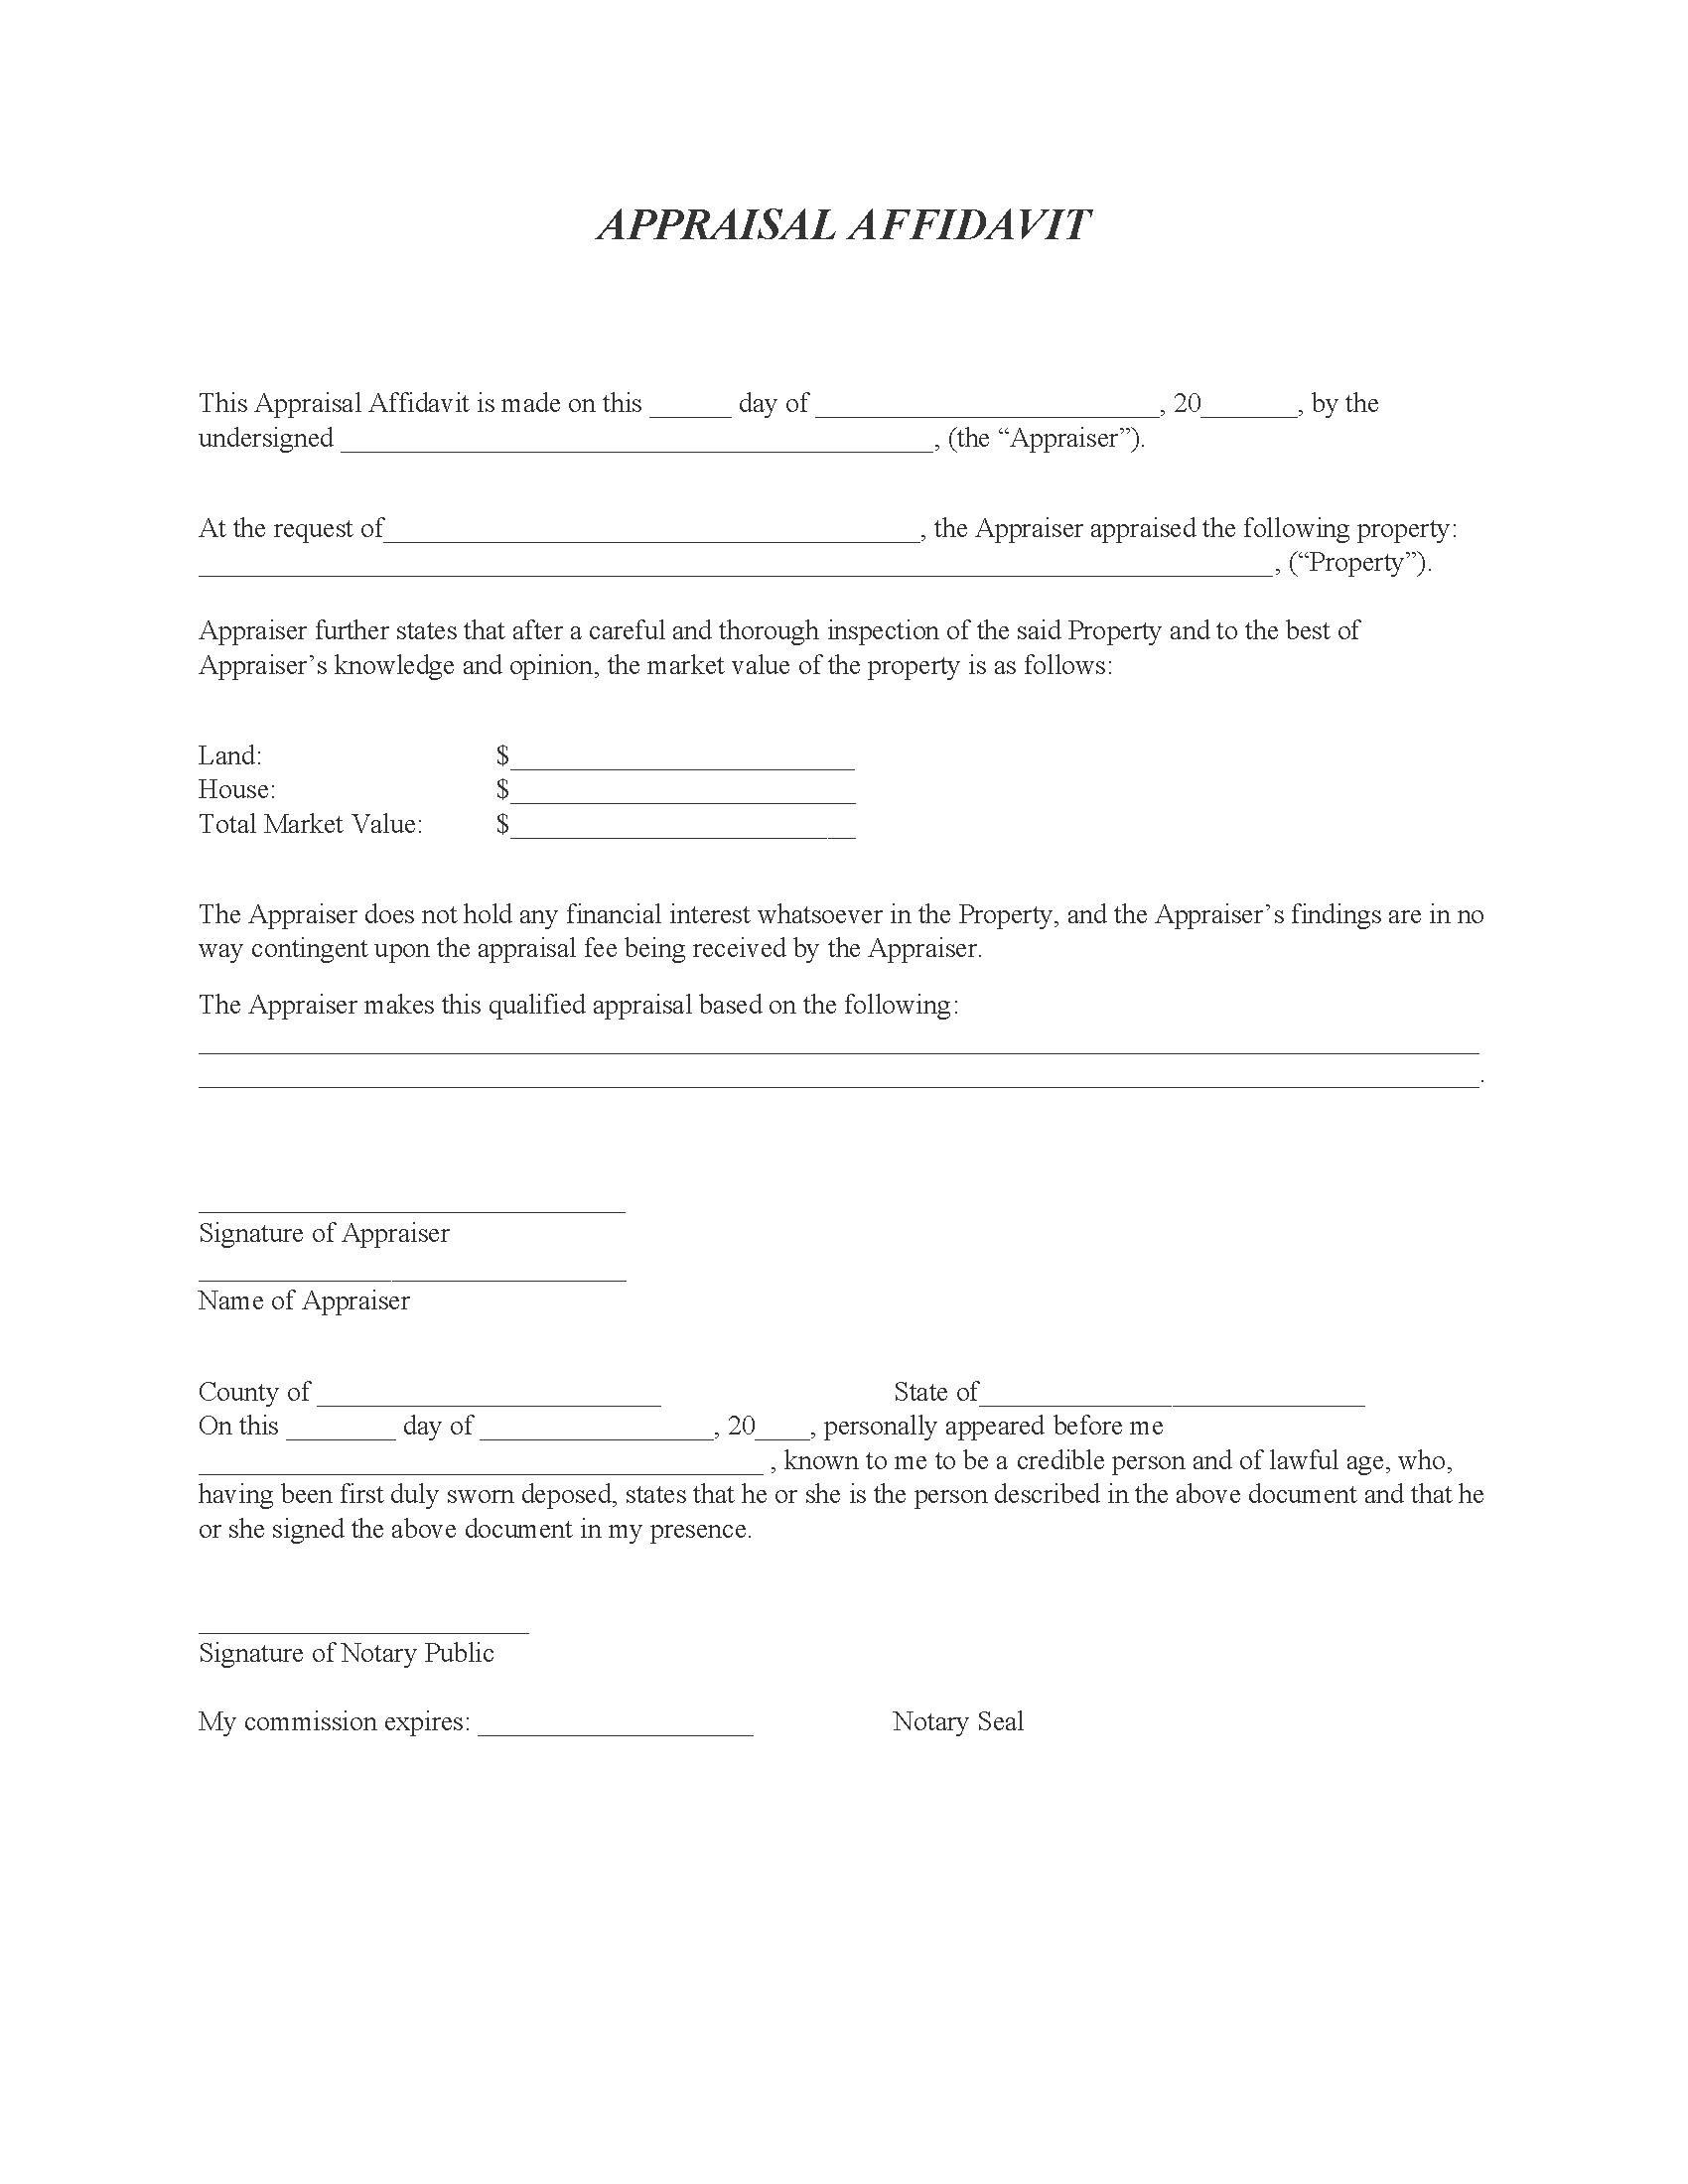 Real Estate Appraisal Affidavit